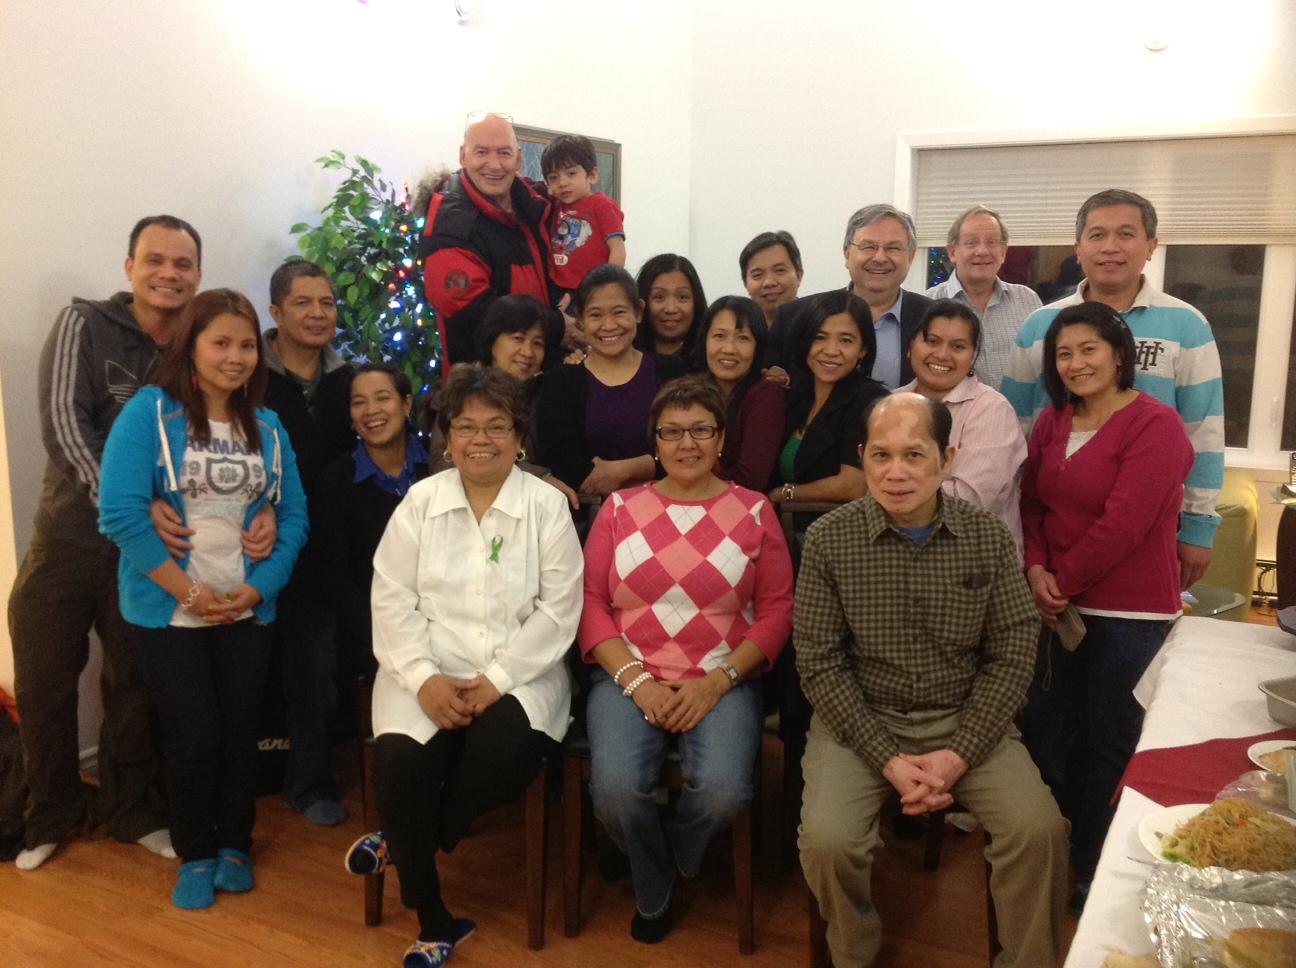 Filipino Christmas Party in Iqaluit. Front row (L-R): Judy Grace Gabuna, Commissioner Edna Elias, and Bob Gabuna. December 2012. (Bob Gabuna)